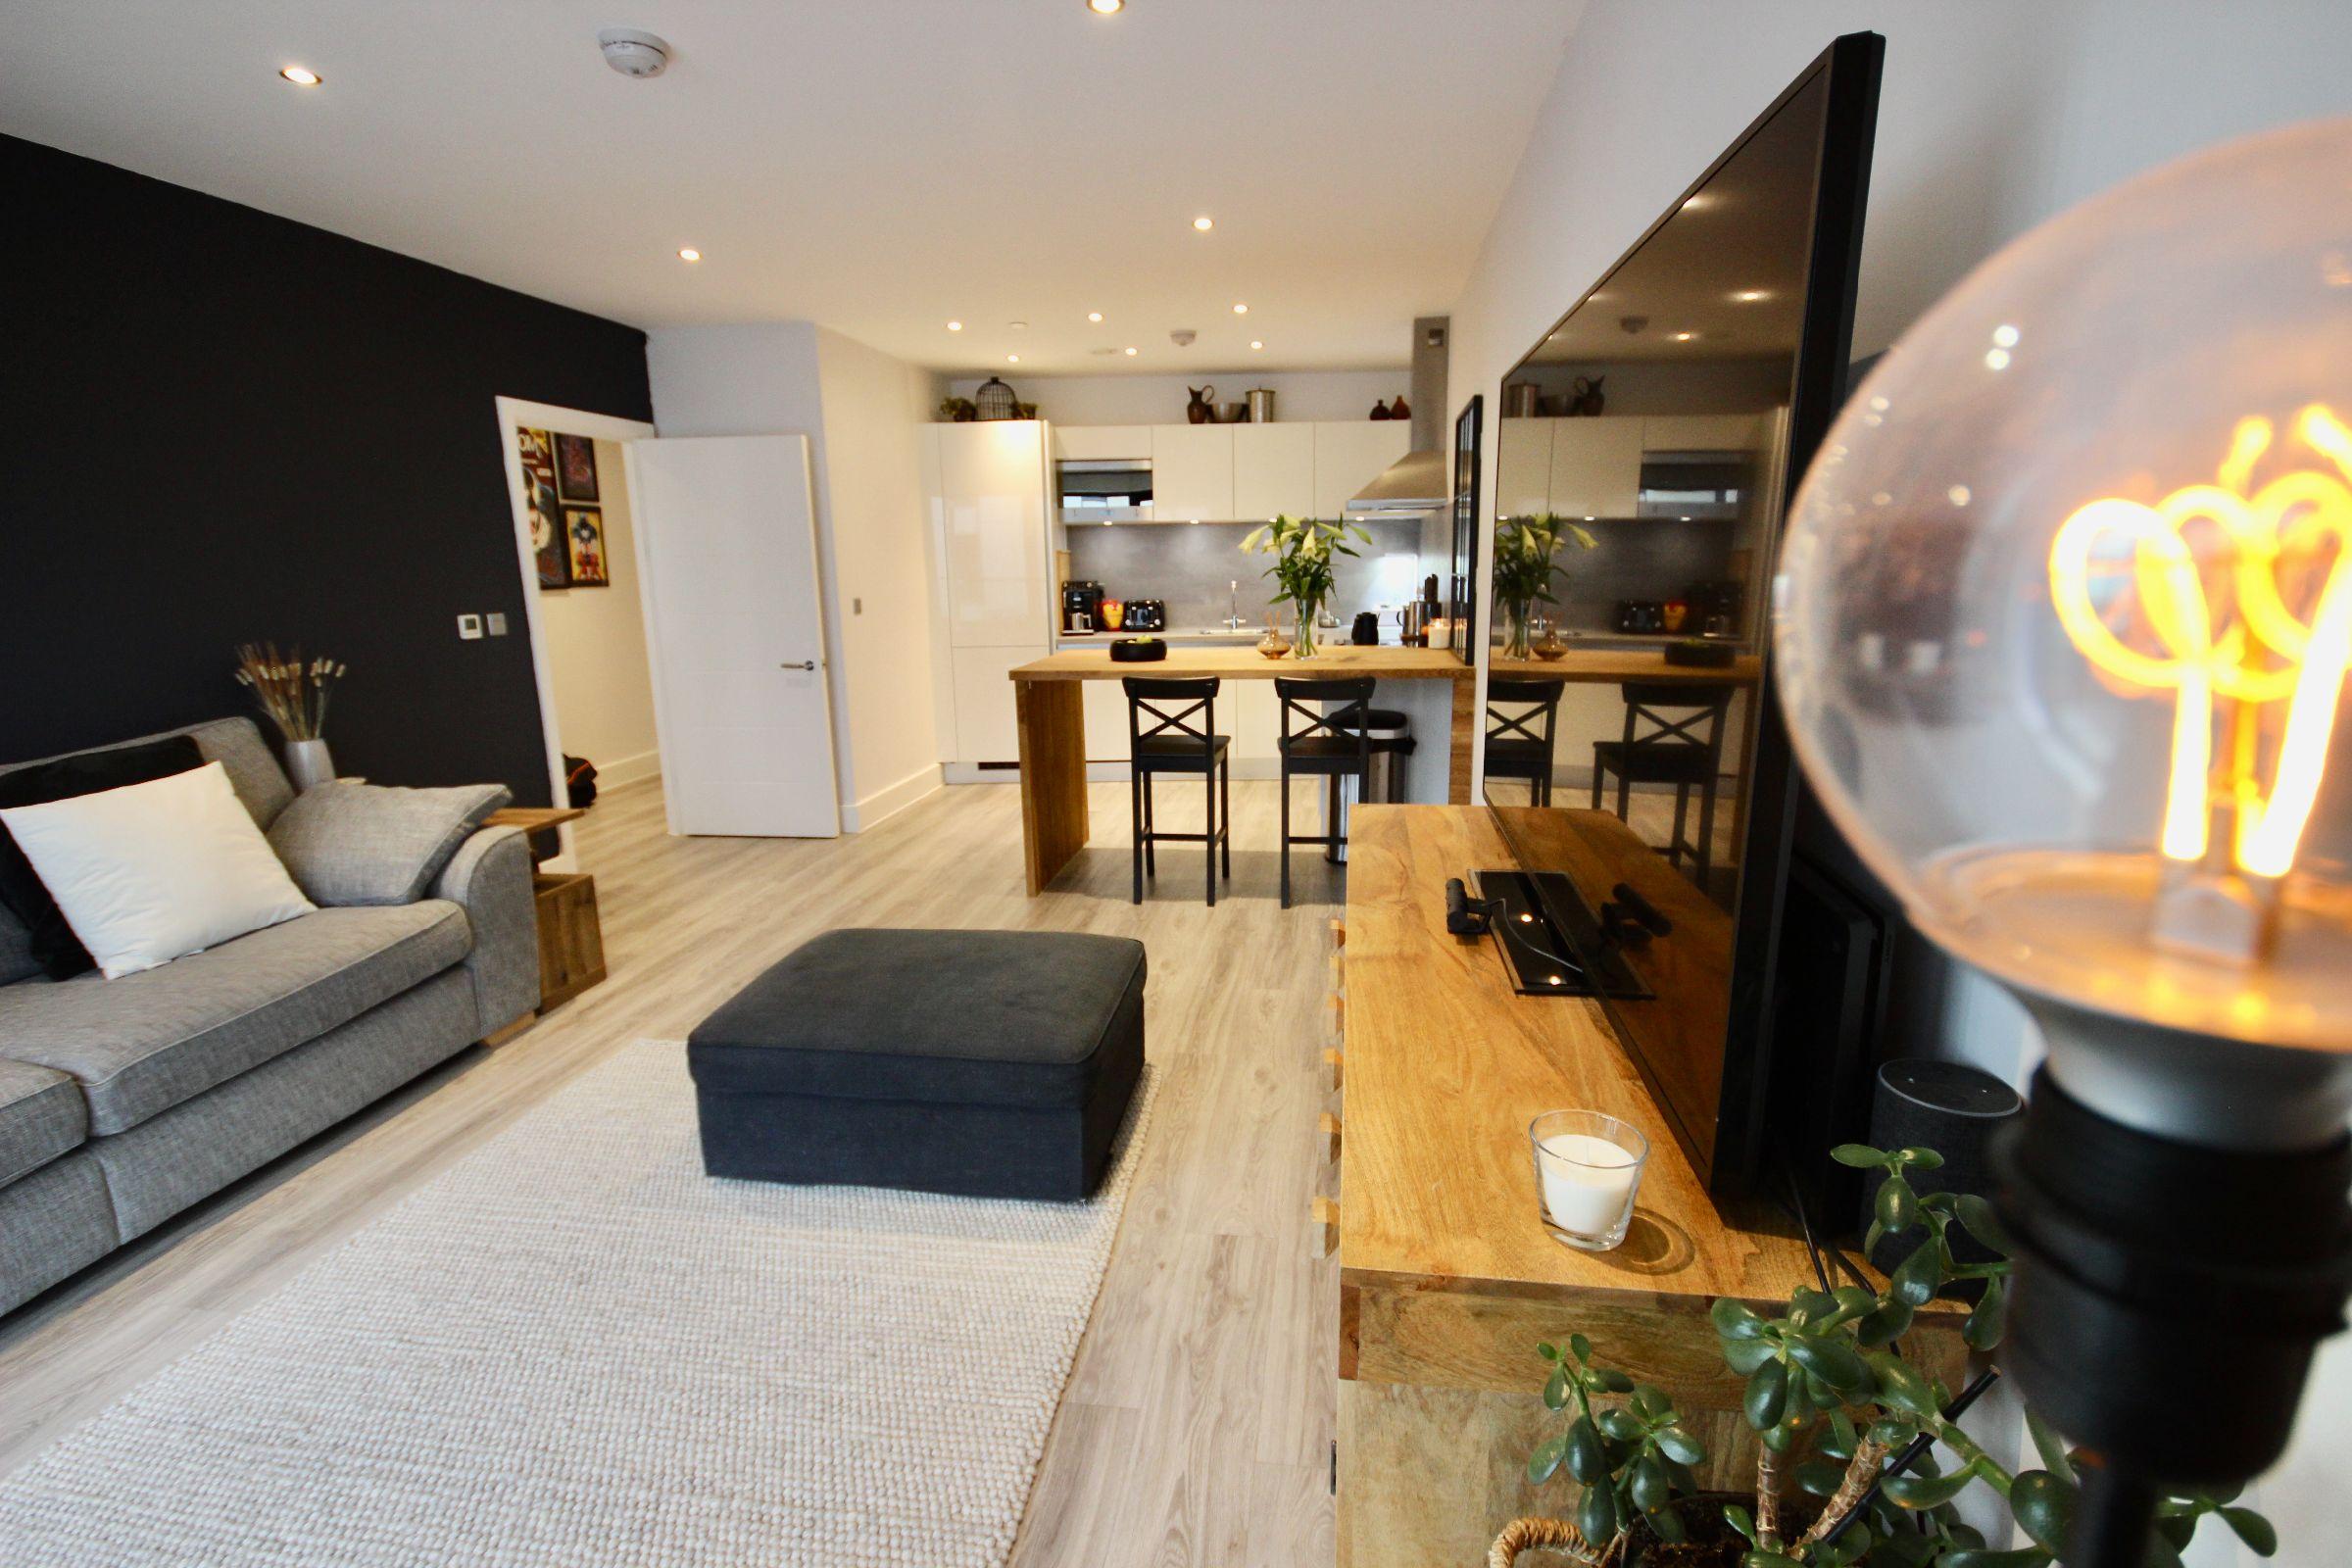 Apartment , Bayscape Cardiff Marina, Watkiss Way, Cardiff